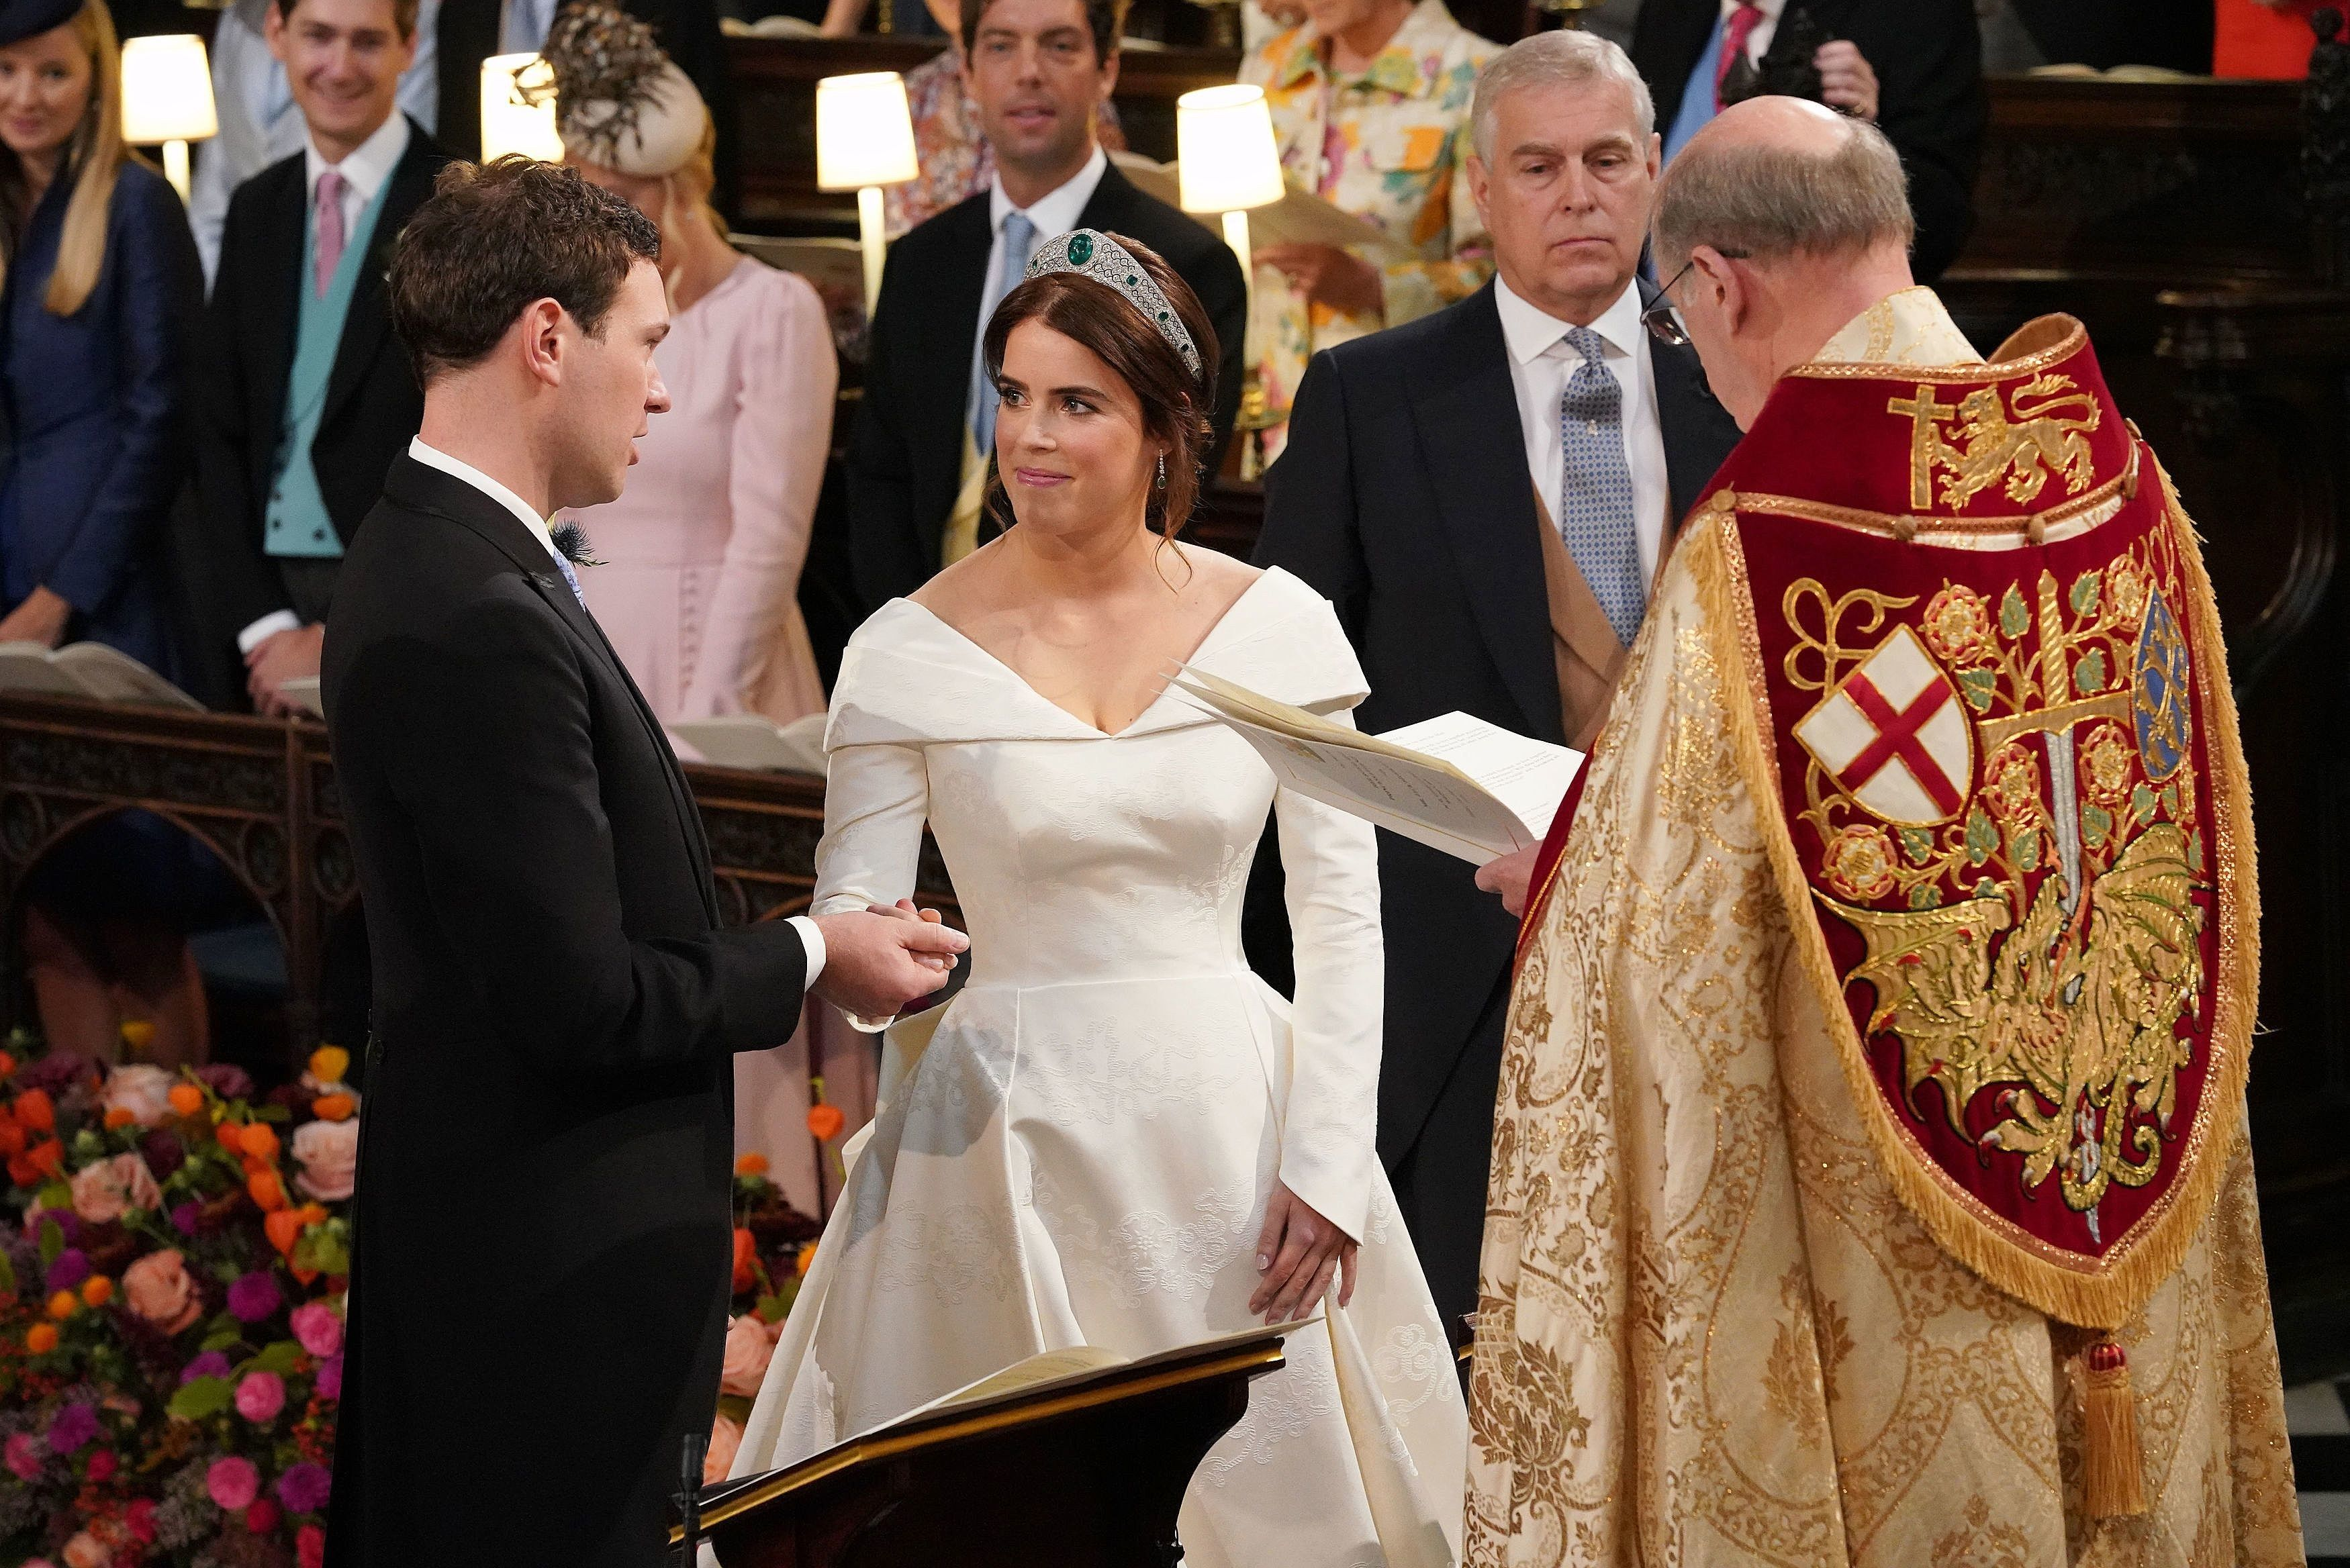 Princess Eugenie and Jack Brooksbank's Royal Wedding